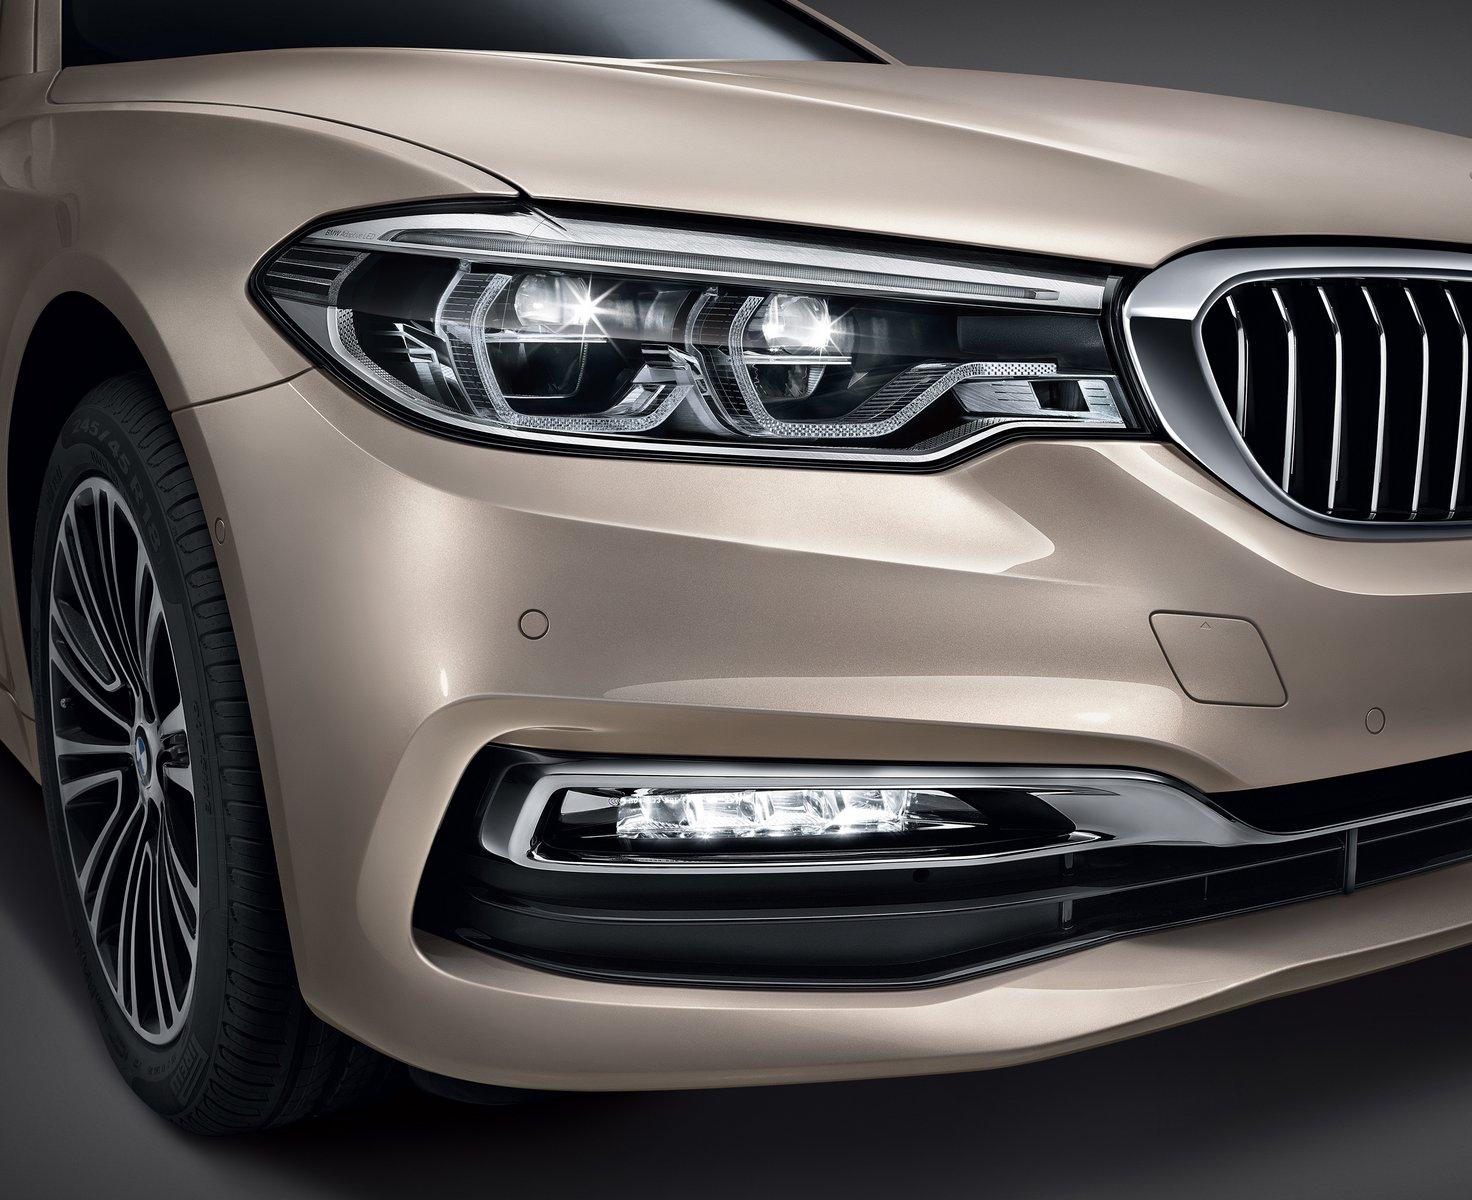 BMW-5-Series-LWB-2.jpg